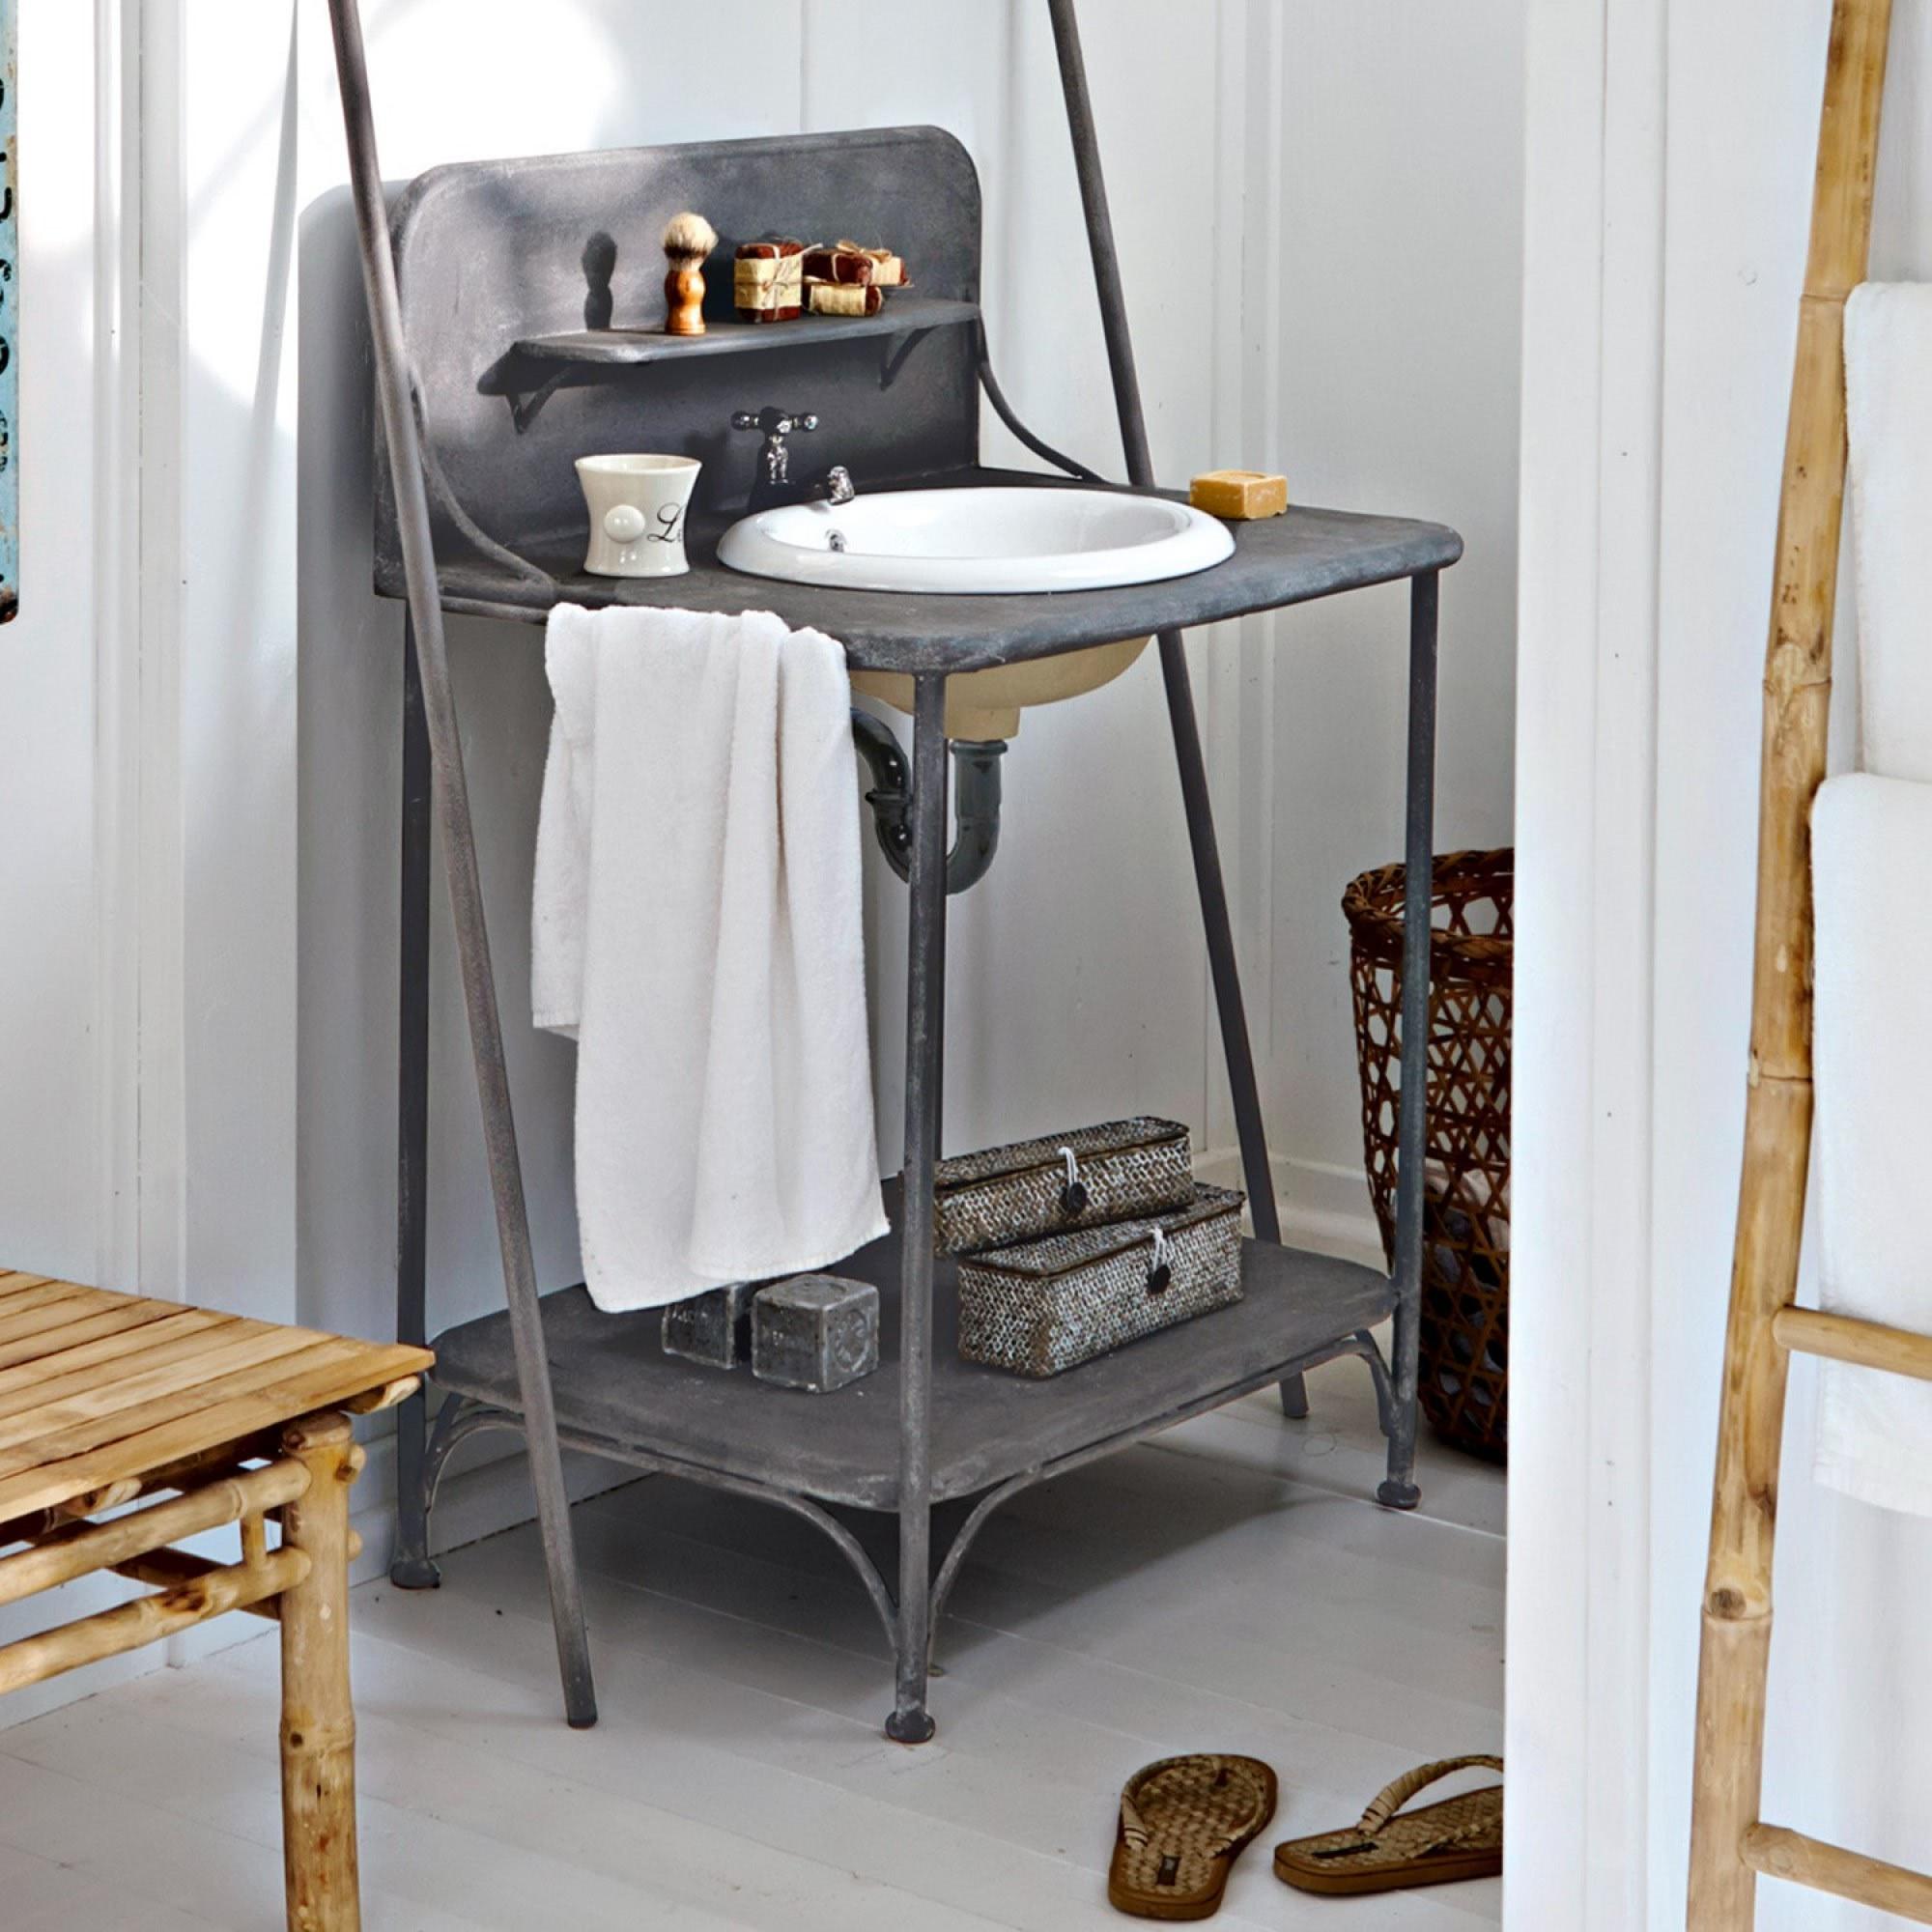 waschtisch dickinson loberon coming home. Black Bedroom Furniture Sets. Home Design Ideas